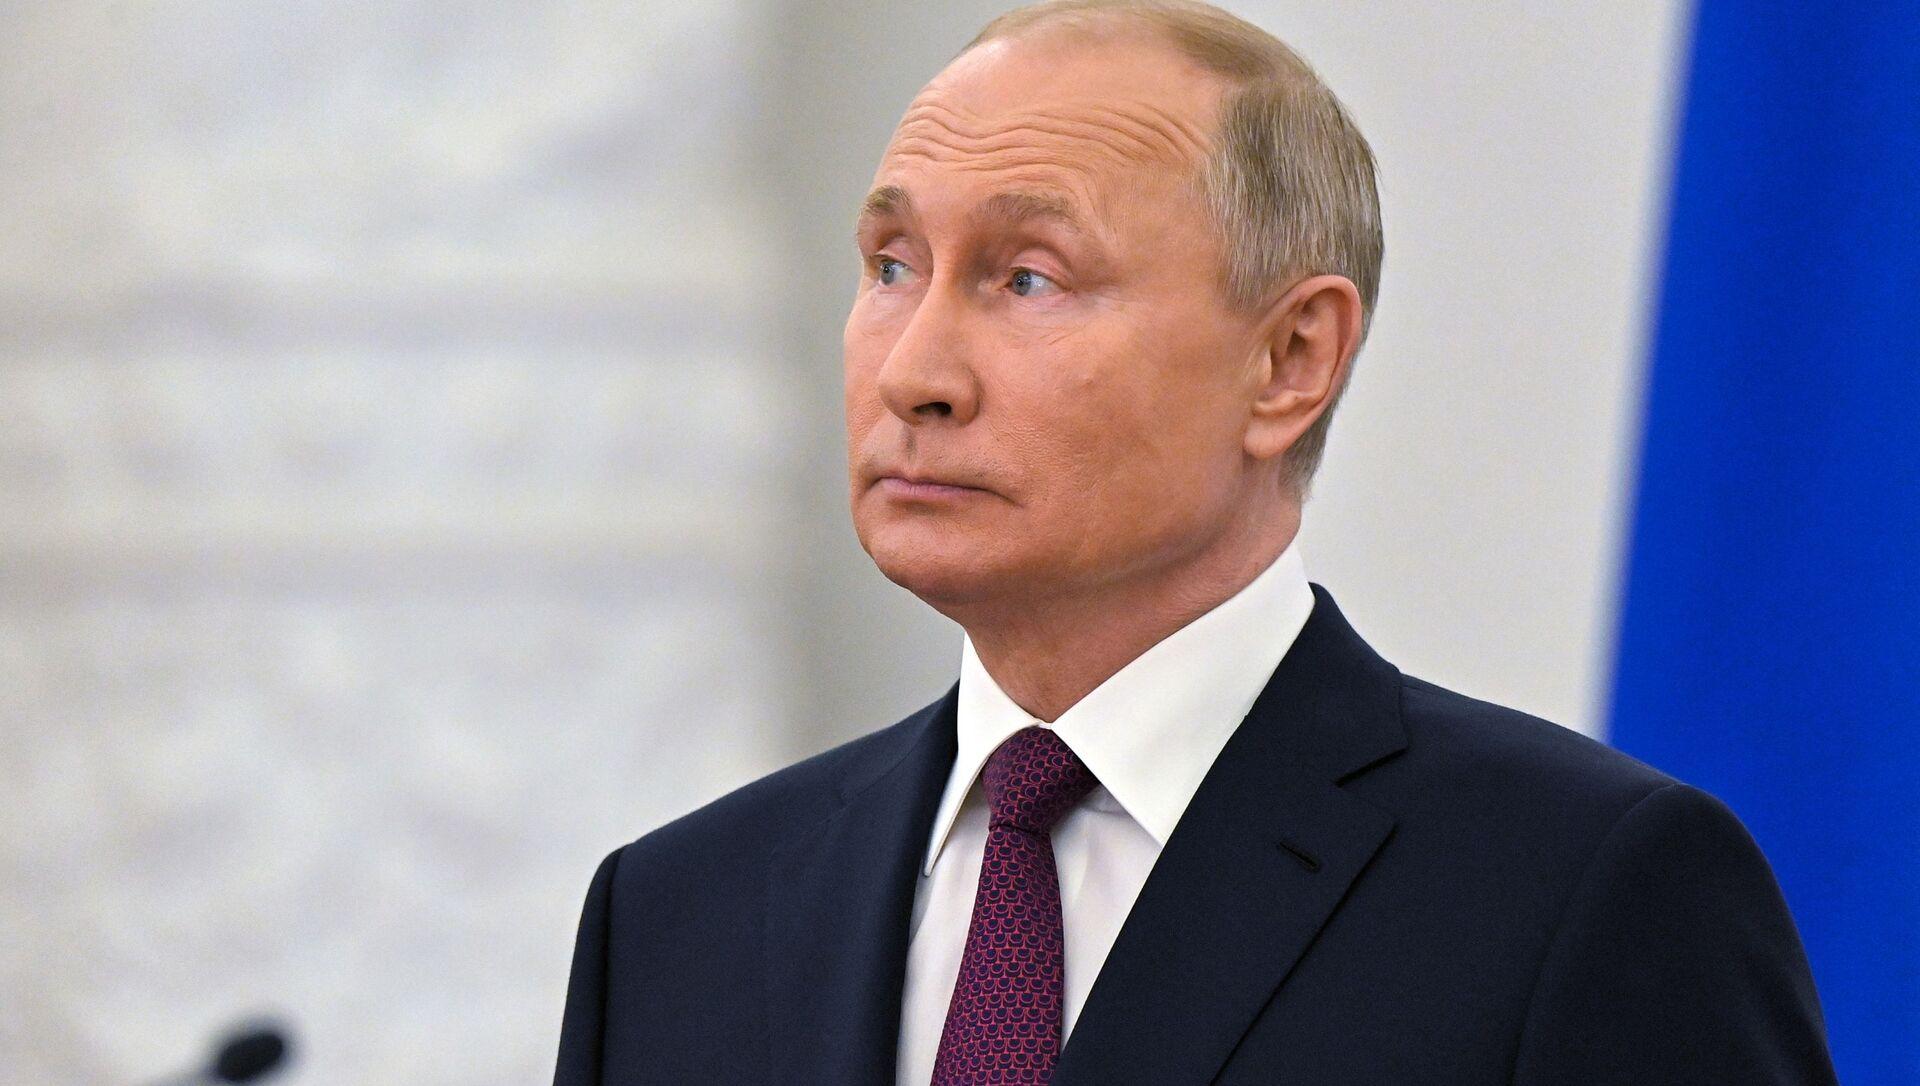 Prezydent Rosji Władimir Putin. - Sputnik Polska, 1920, 13.06.2021